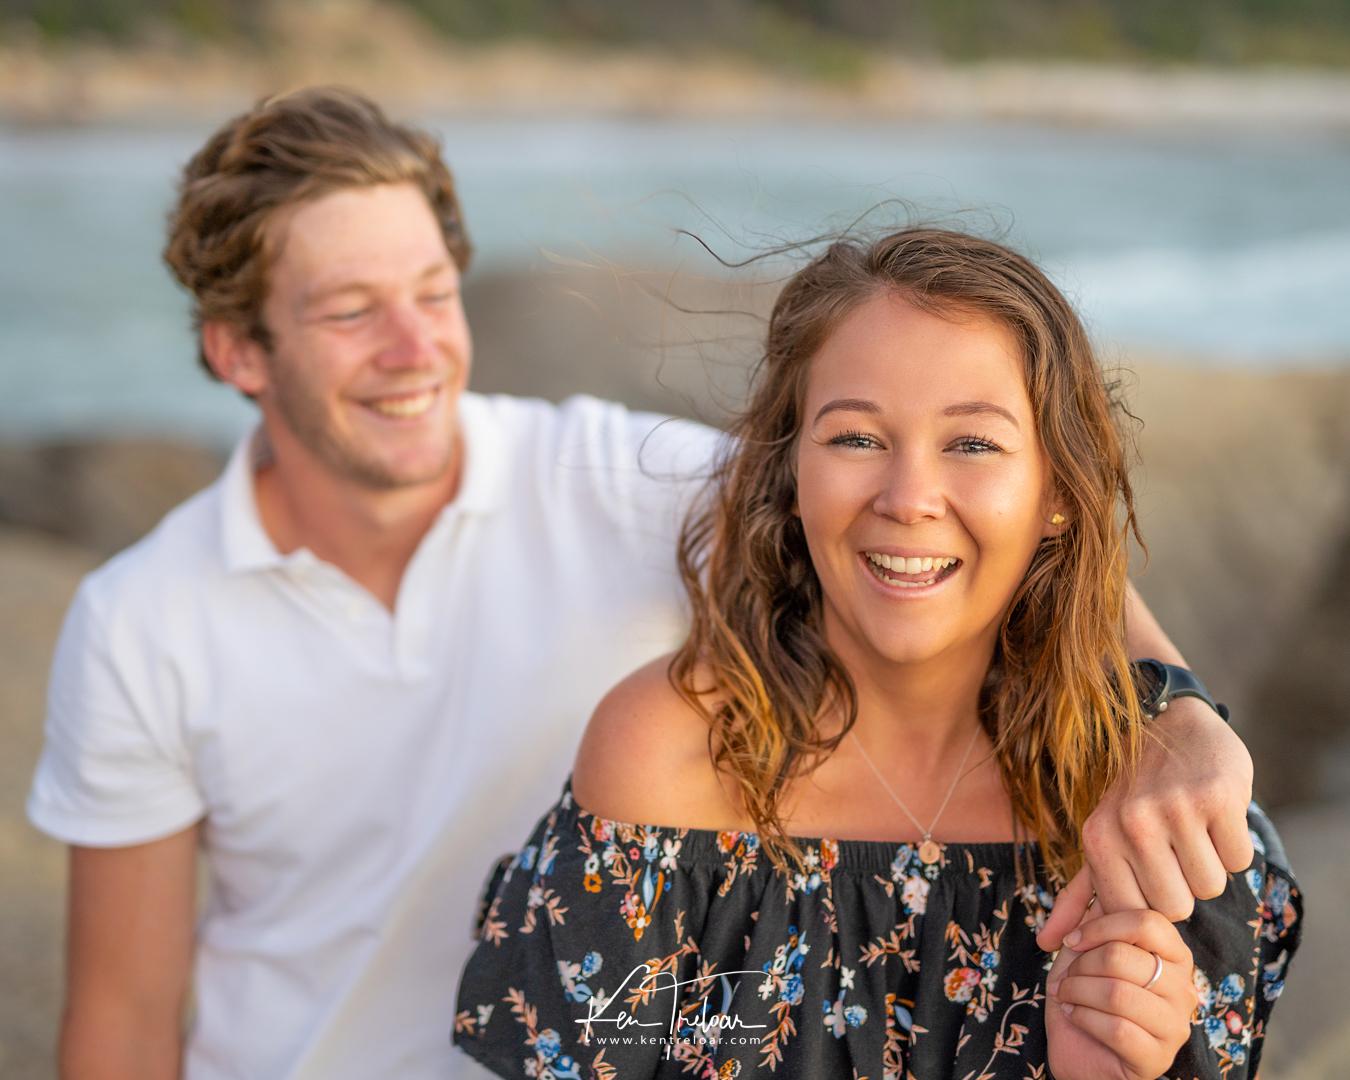 Ken Treloar Photography - _Llandudno_Sunset Couples Session 2019-10.jpg